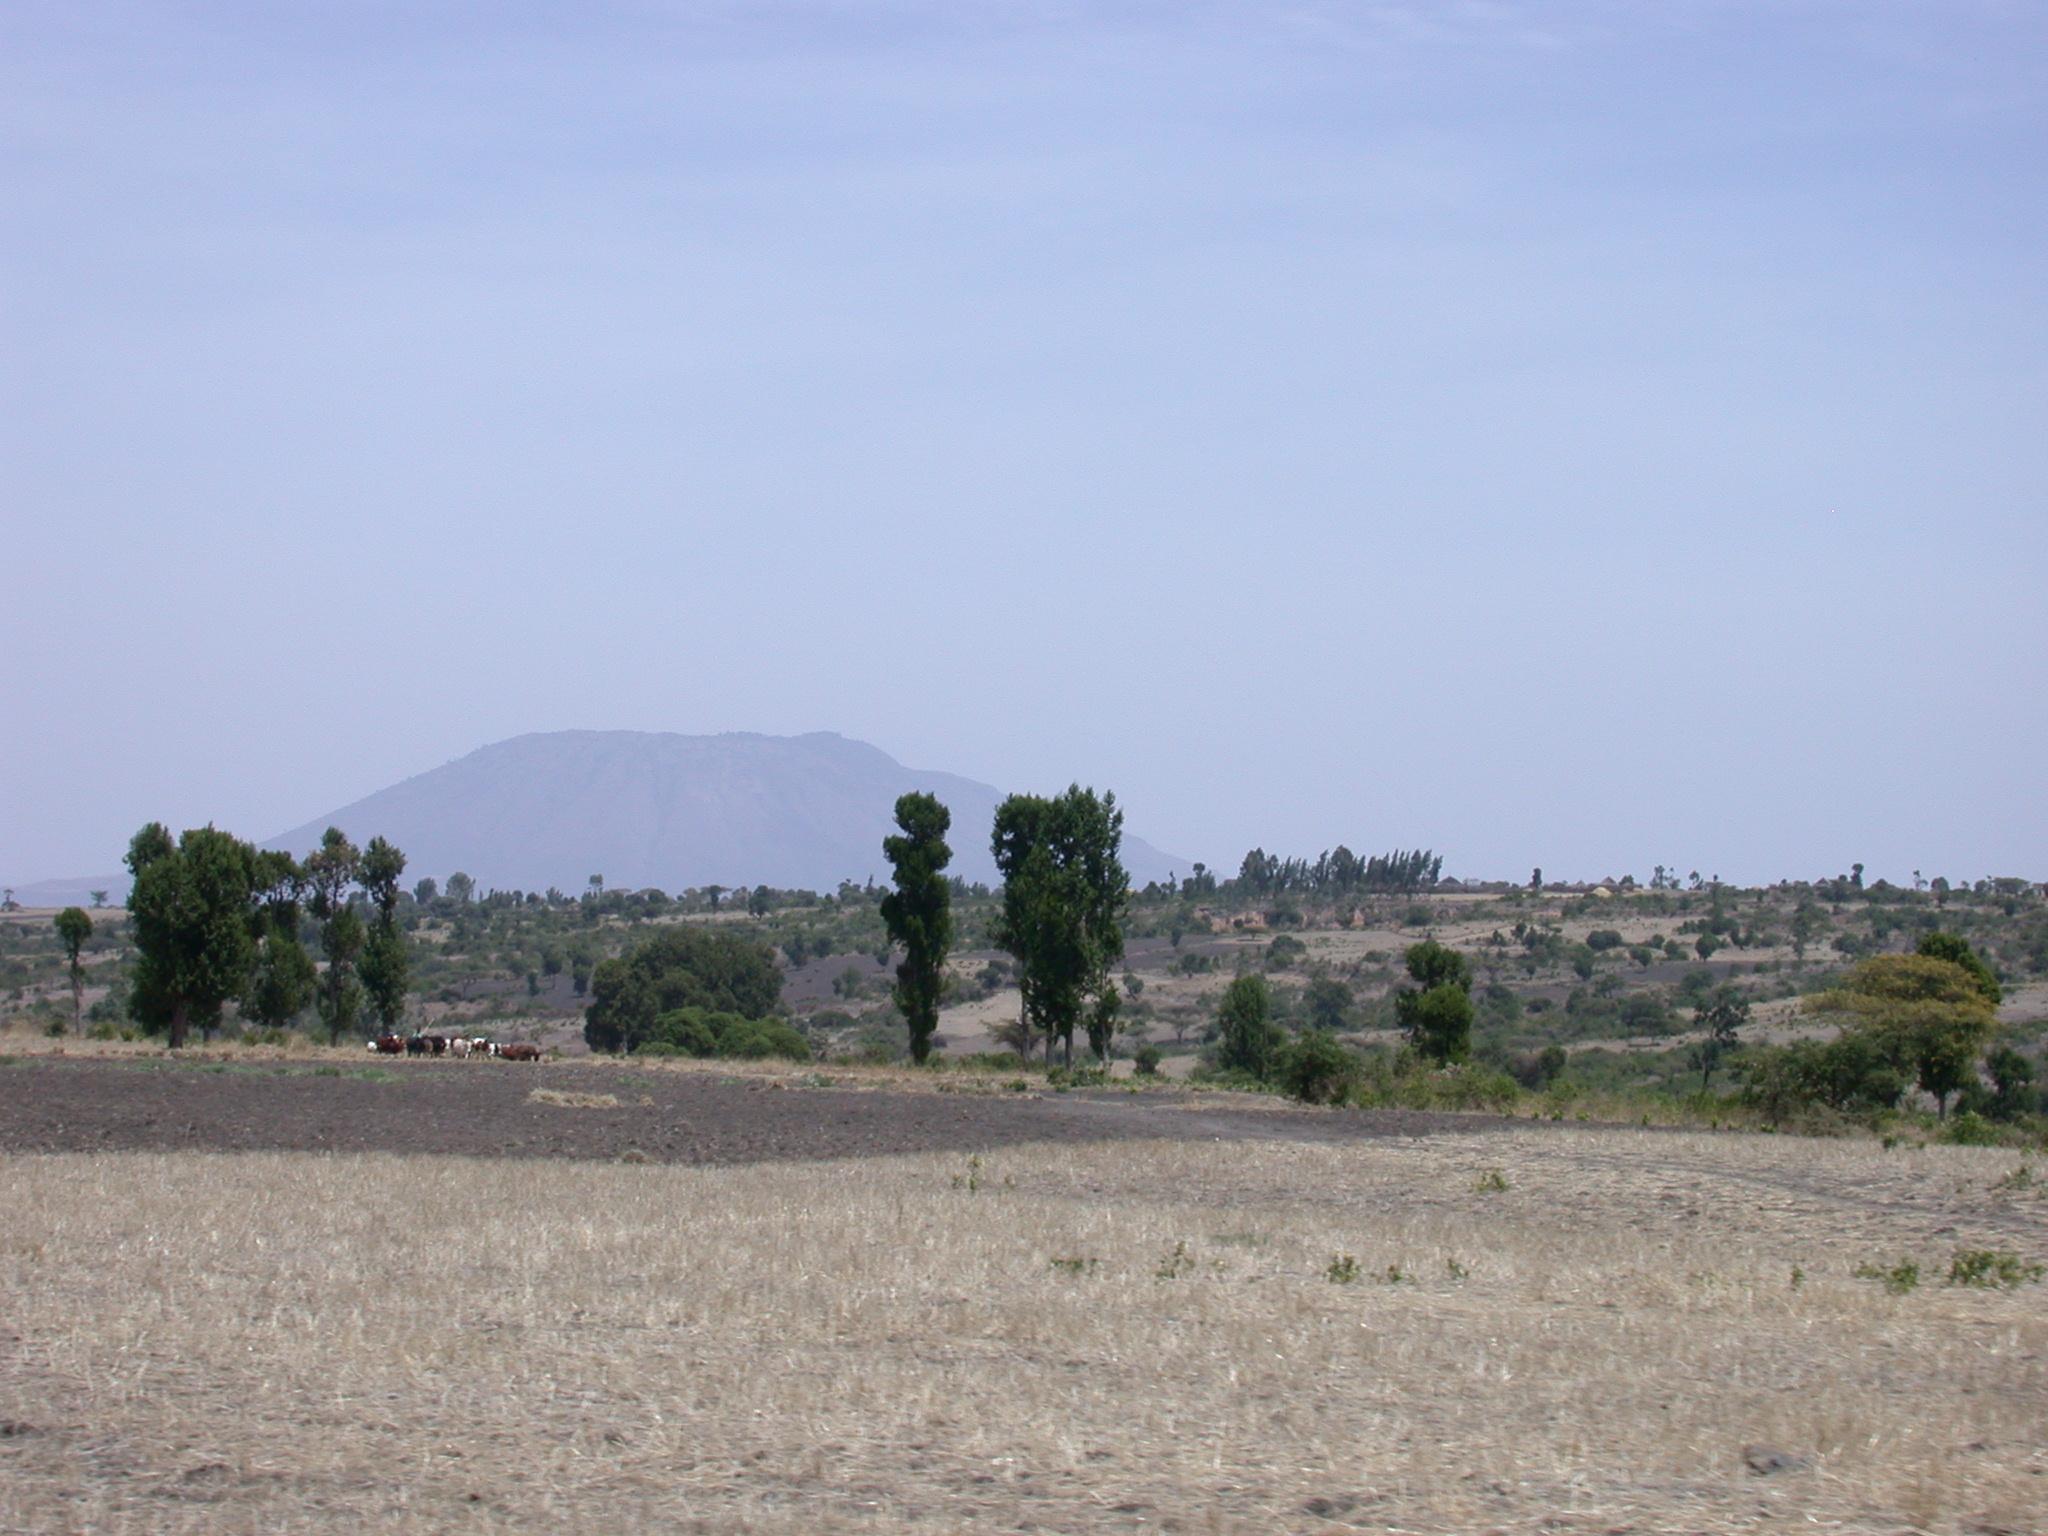 Mount Zokuala (Probably), Outside Addis Ababa, Ethiopia